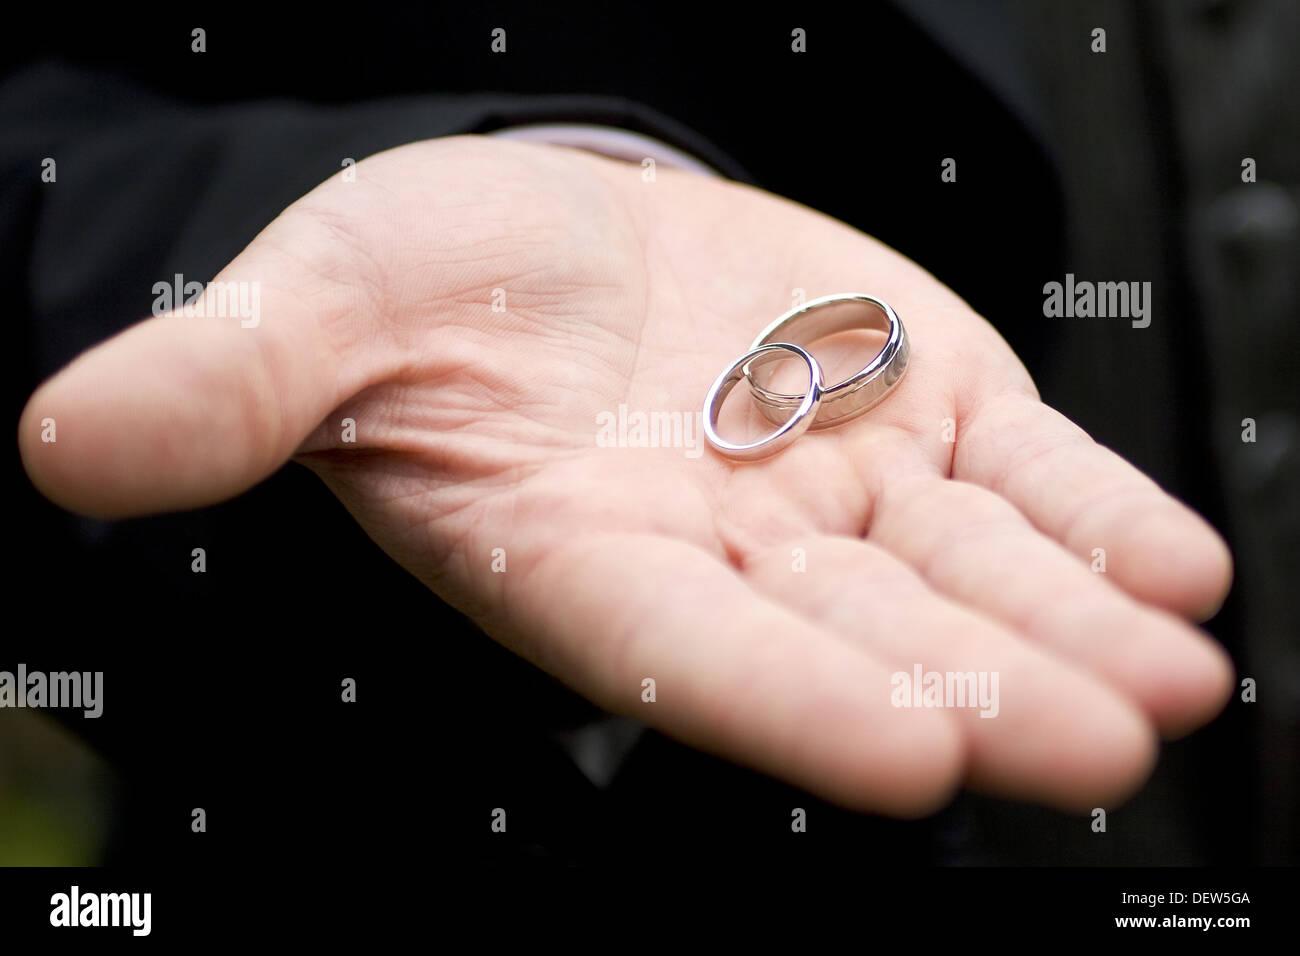 Gold Ring Hand Imágenes De Stock & Gold Ring Hand Fotos De Stock - Alamy